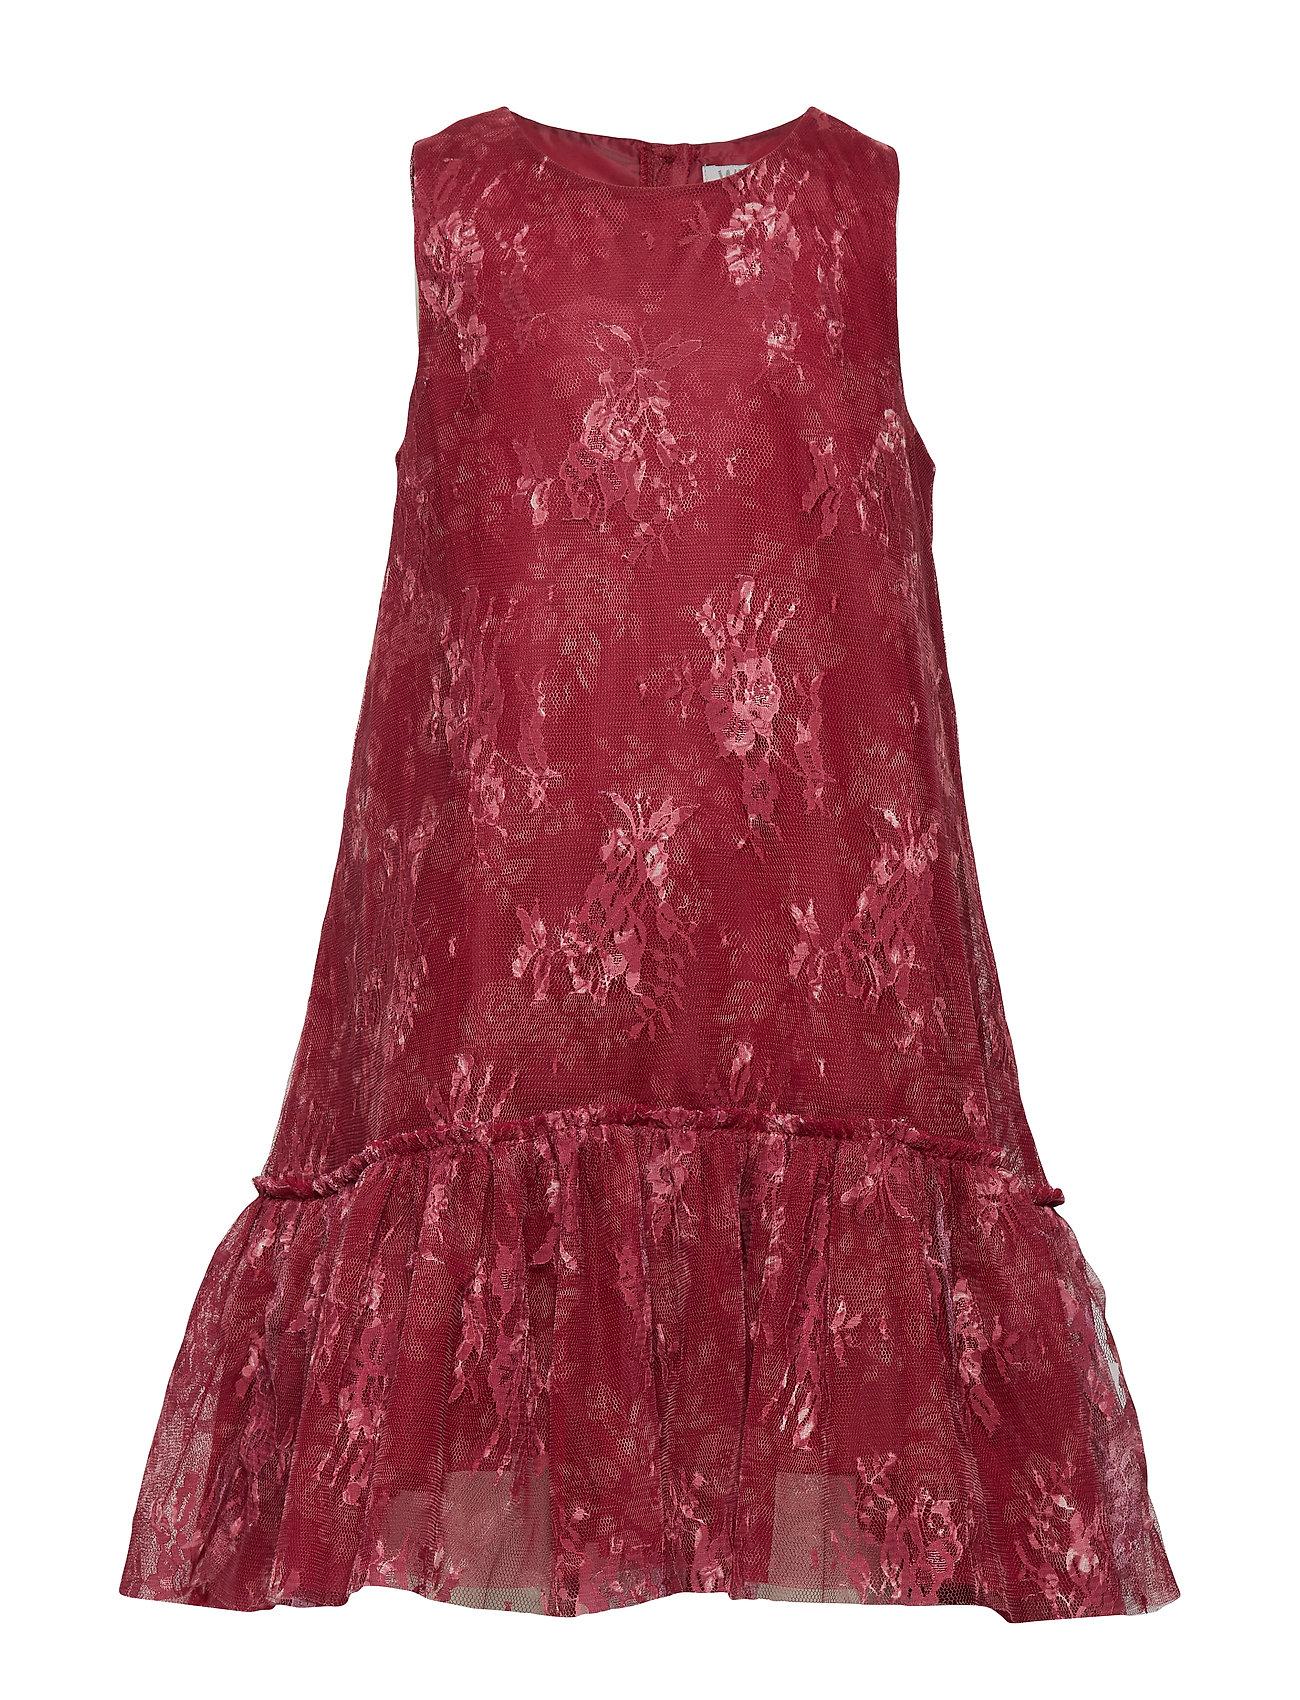 Wheat Dress Malia - DARK BERRY